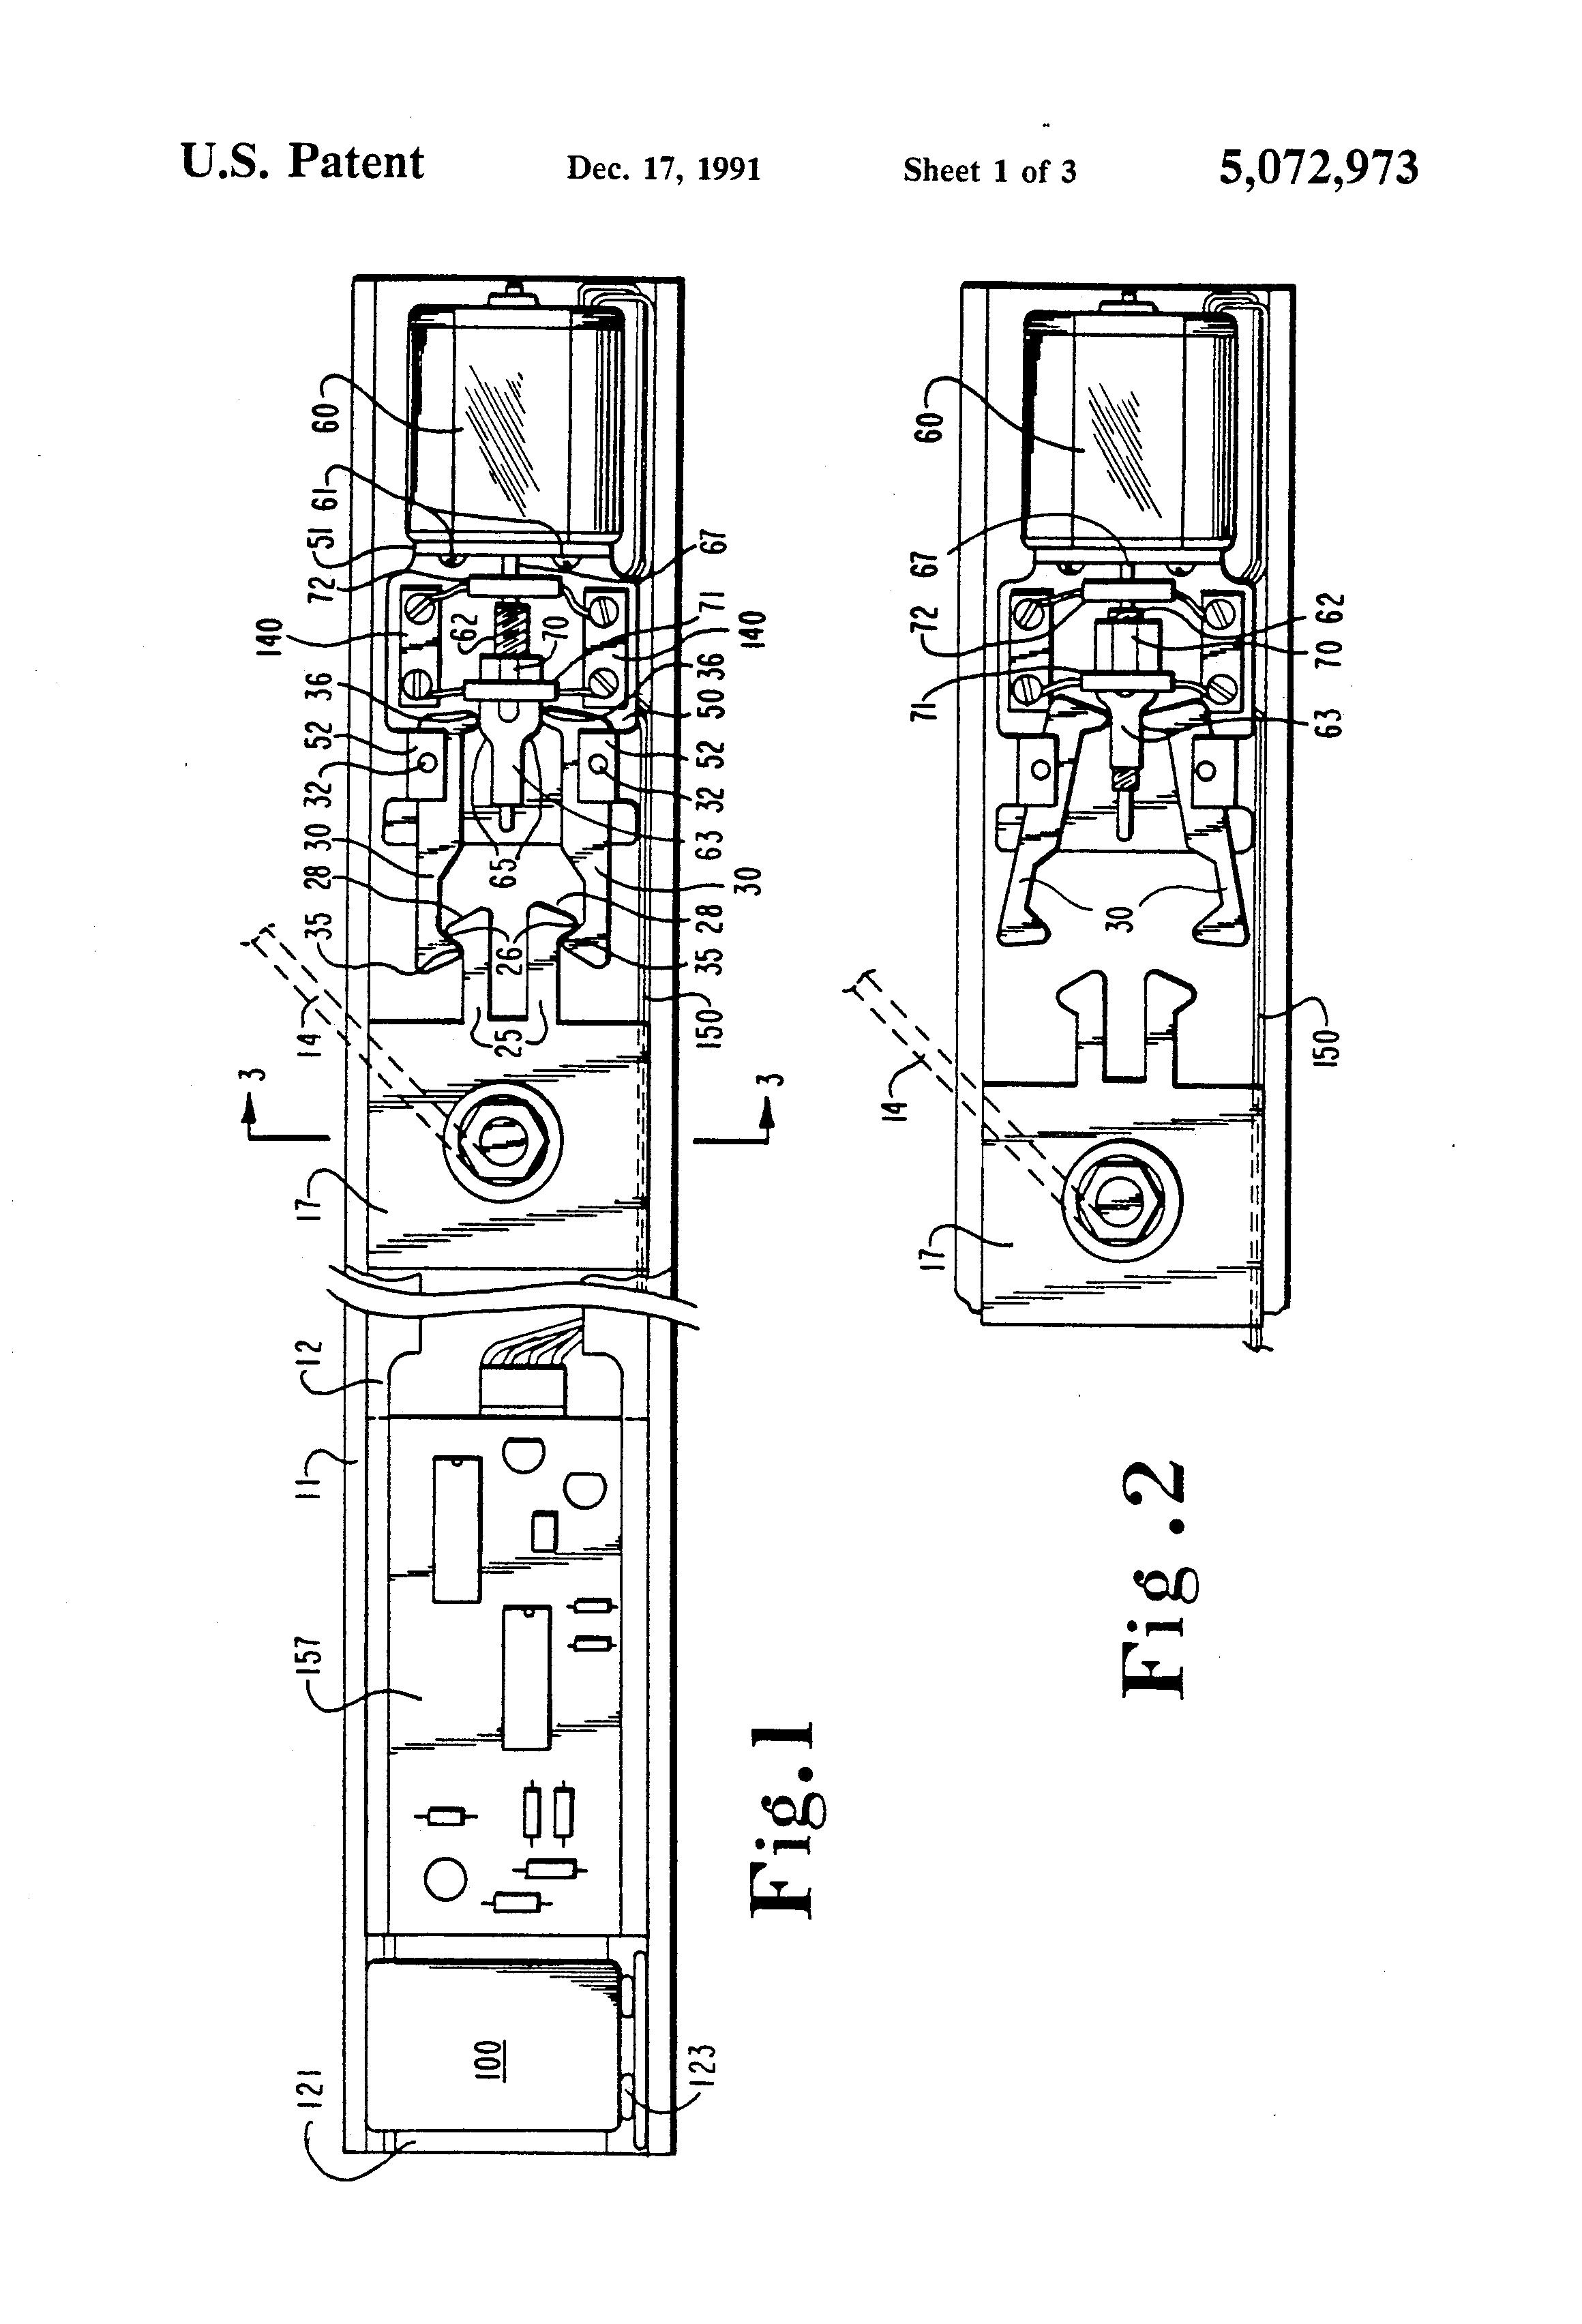 Suzuki gn 125 wiring diagram amalgamagency co marvellous suzuki hoffberg alternator wiring diagram rh schooldekho co by kaeden morrow asfbconference2016 Image collections